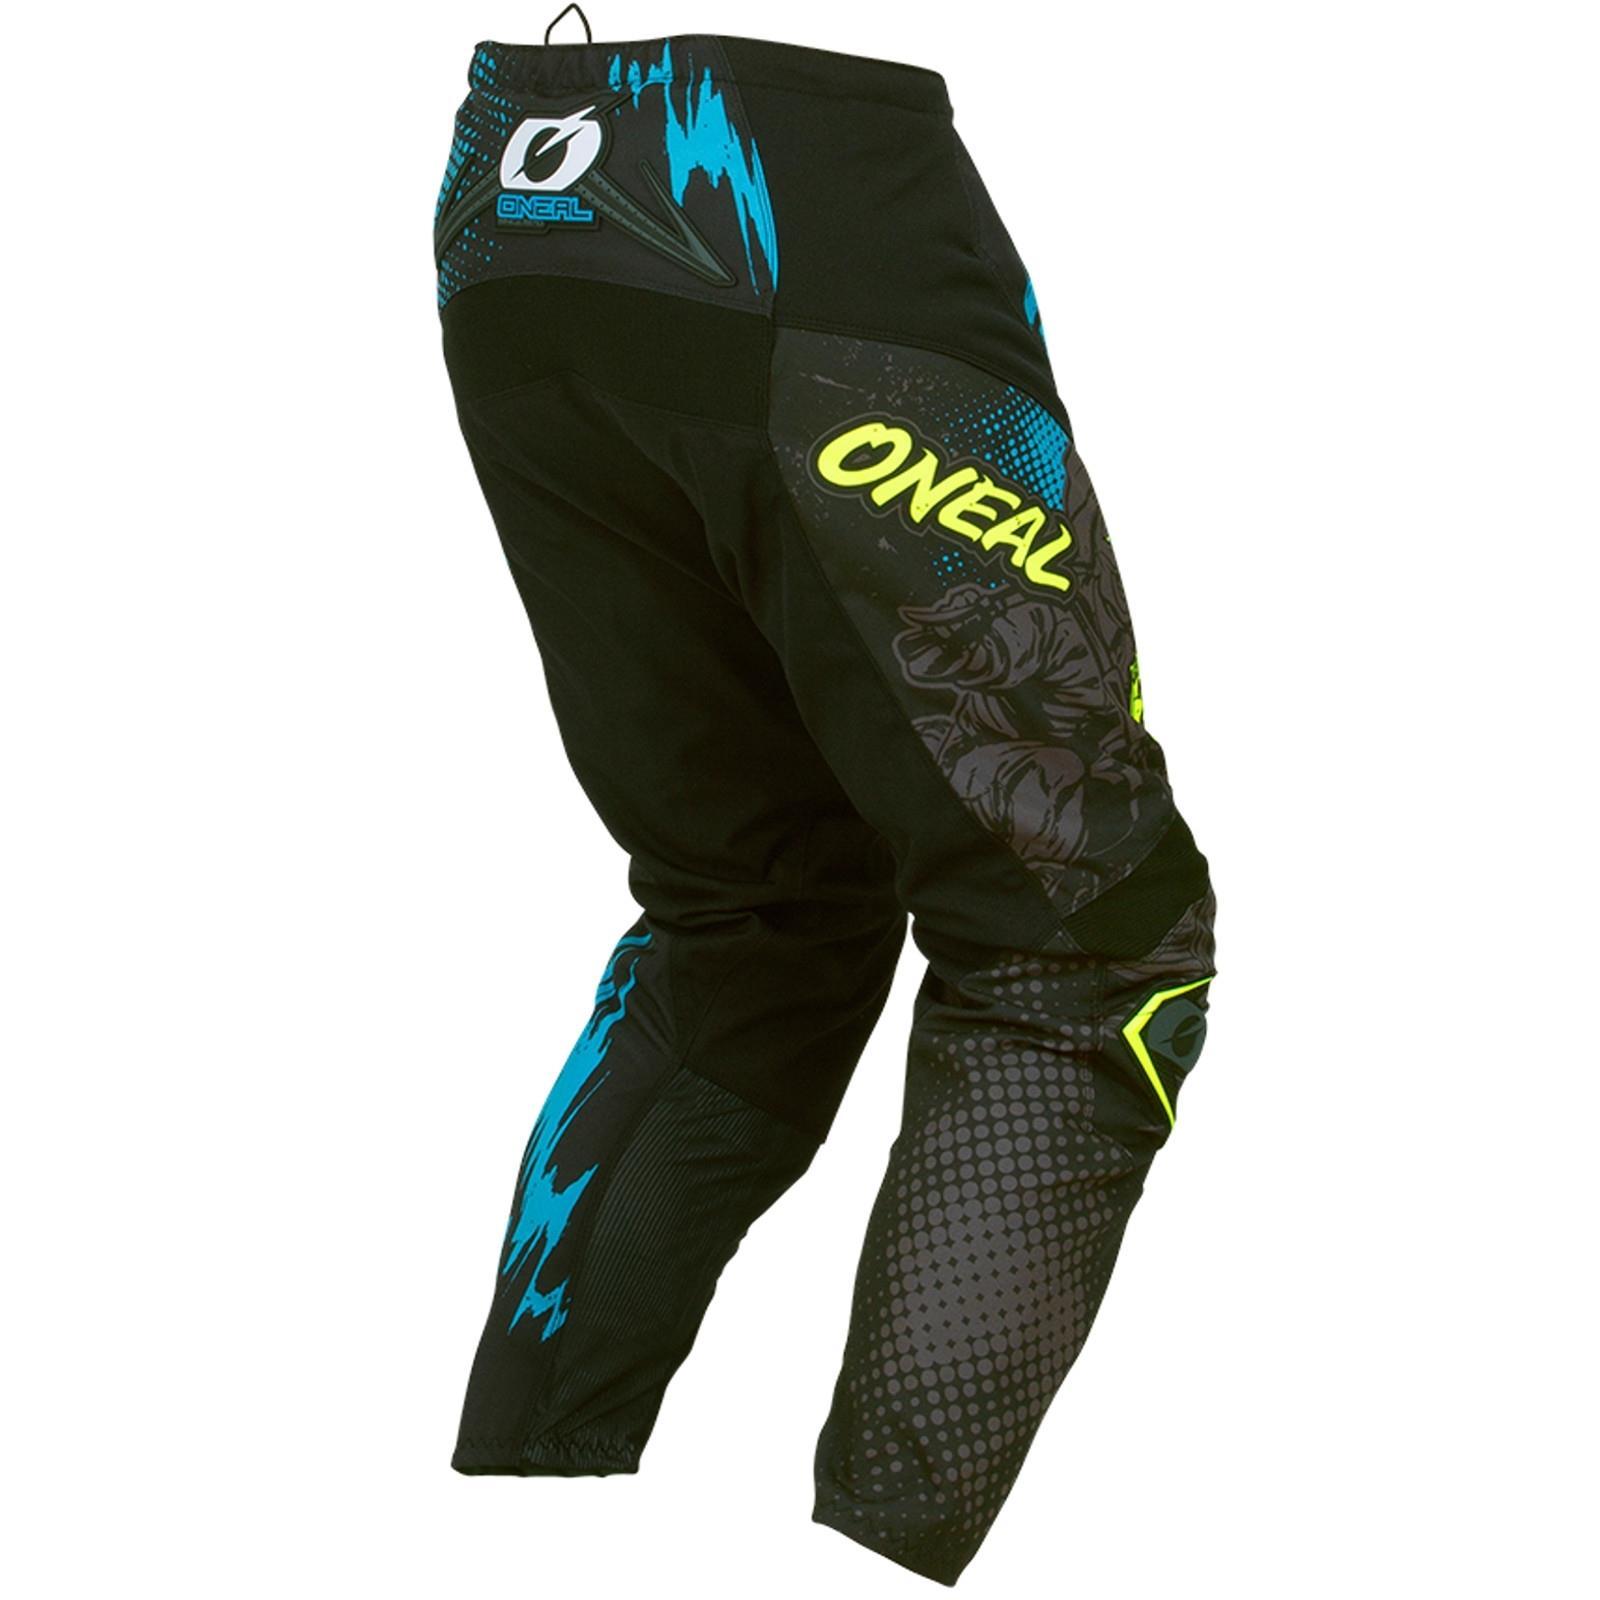 ONeal-pantalones-de-Jersey-de-los-ninos-de-pantalones-cortos-ninos-MX-bicicleta-DH-montana-bicicleta miniatura 127